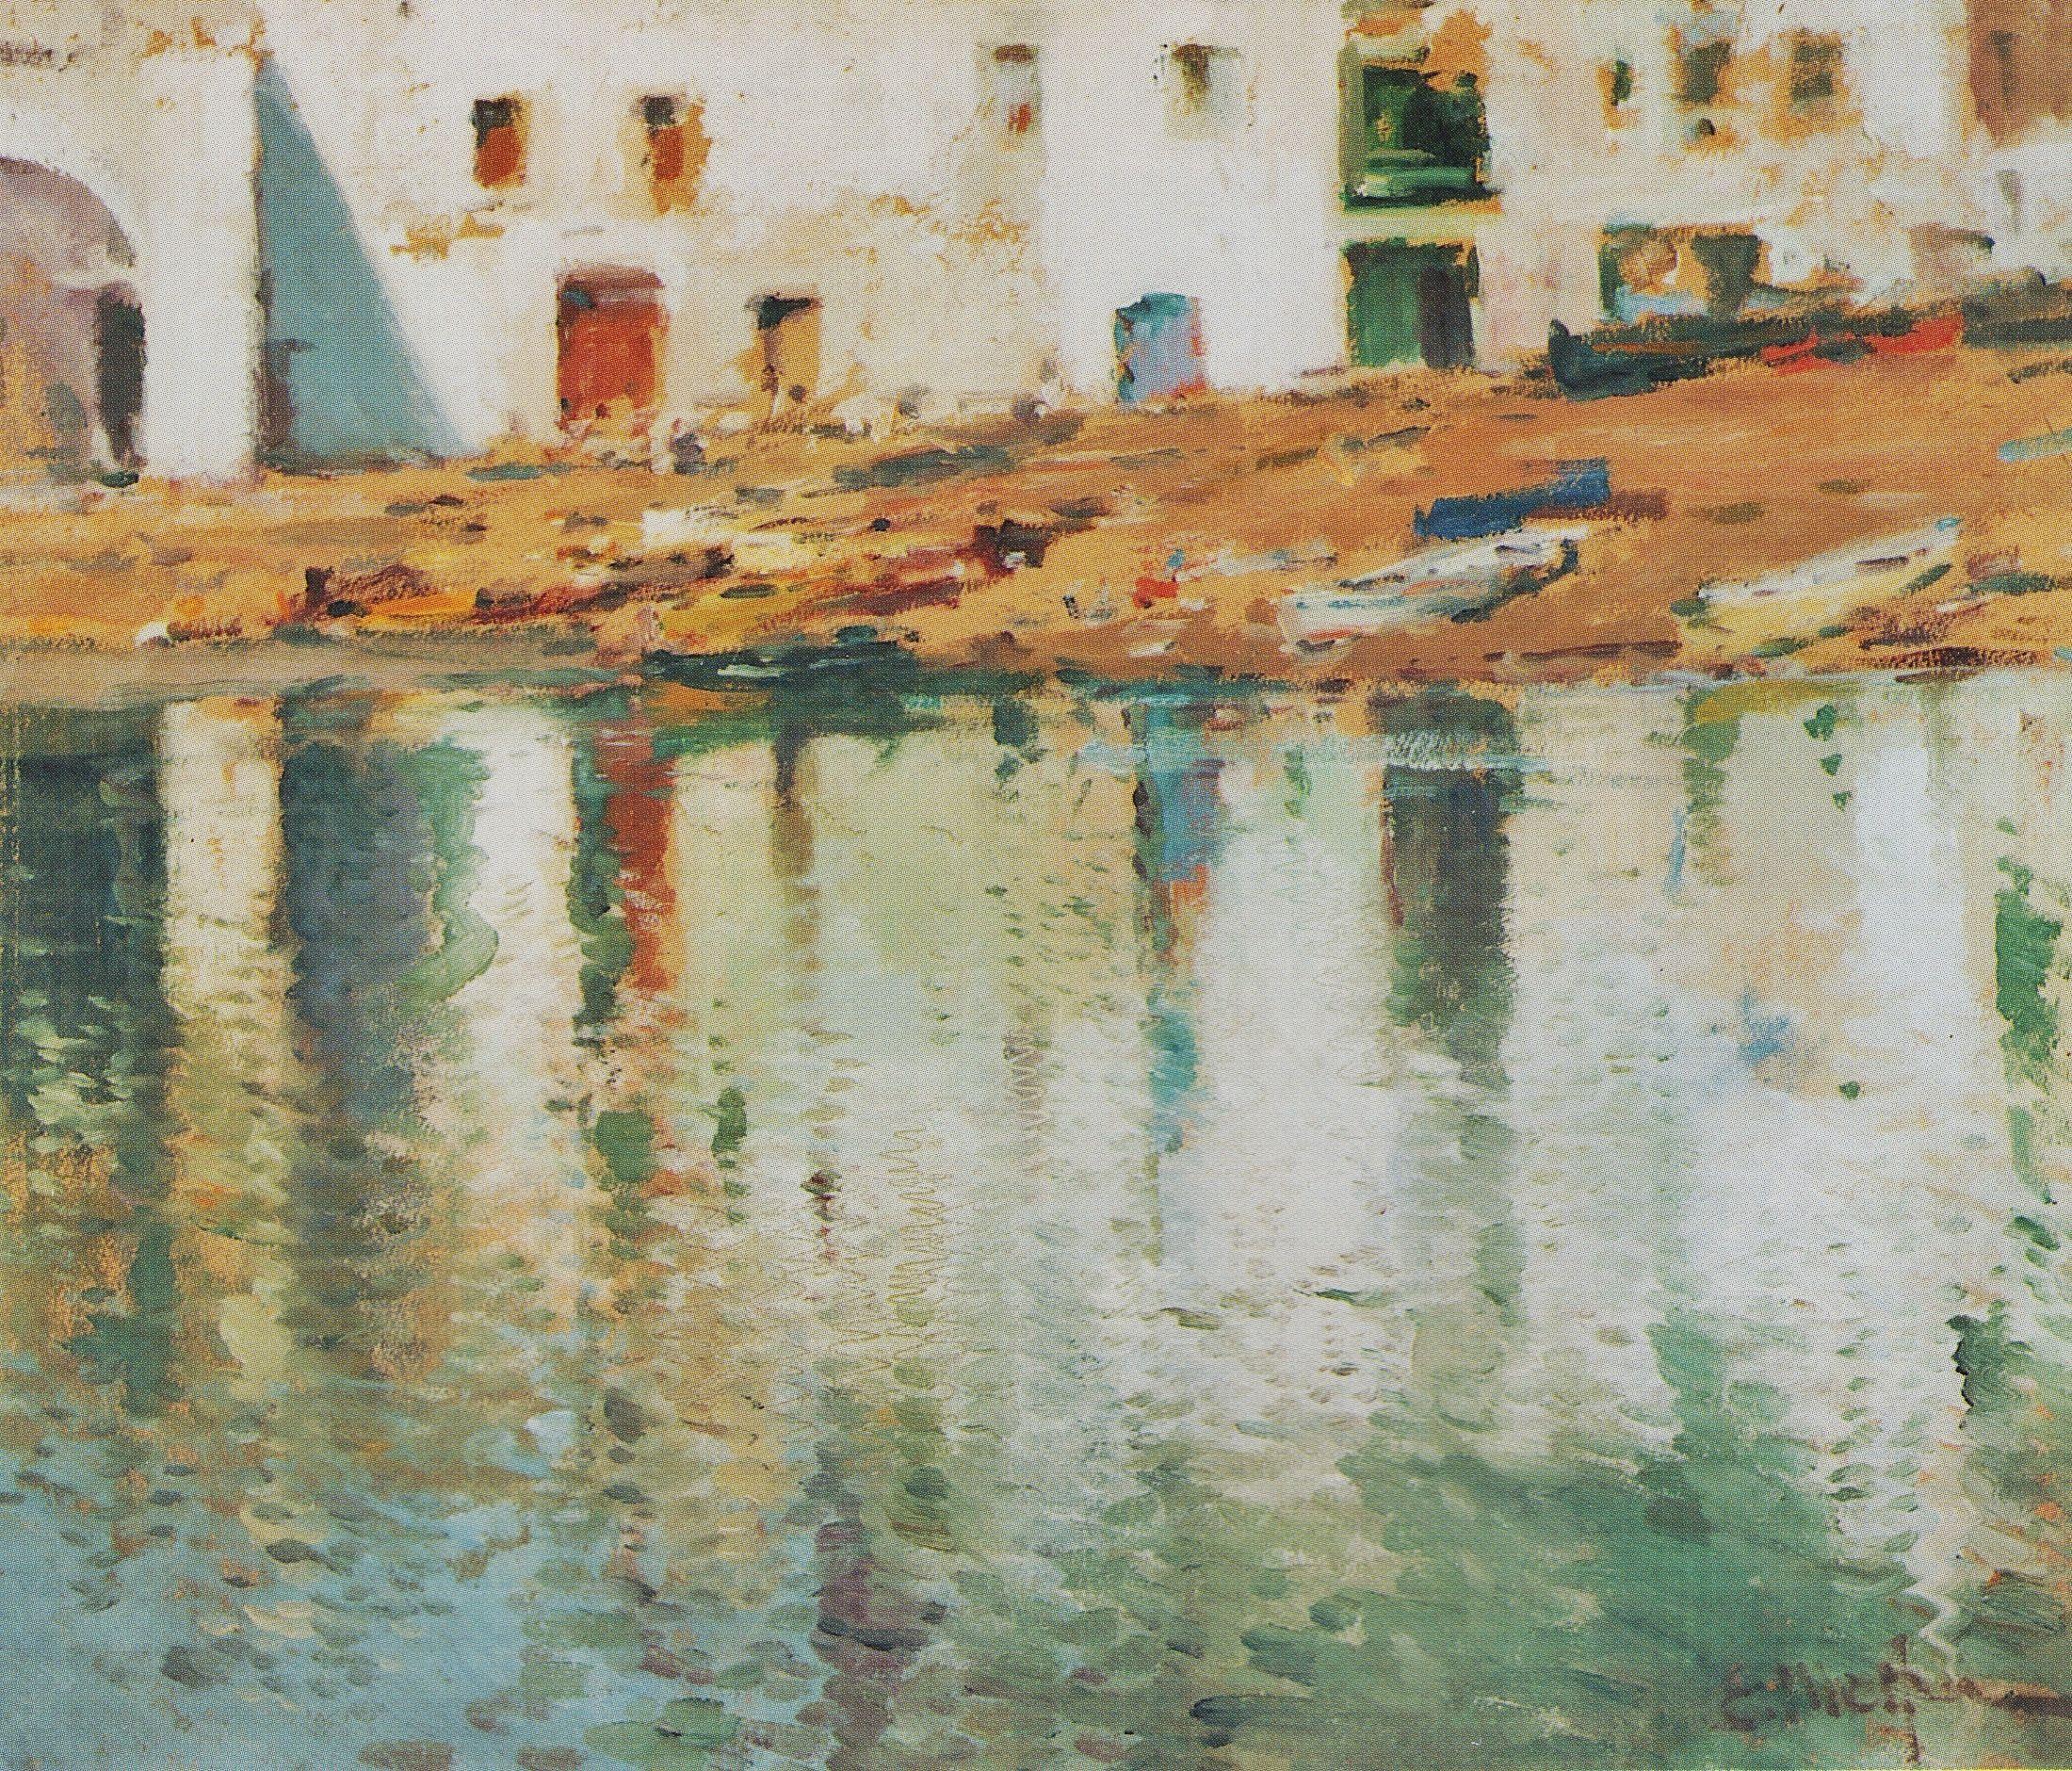 Eliseo Meifrén Roig. Cadaqués, Girona. Óleo sobre lienzo. Firmado. 60 x 80 cm. Galería Manuel Mayoral, Barcelona, abril de 2002, p. 33.